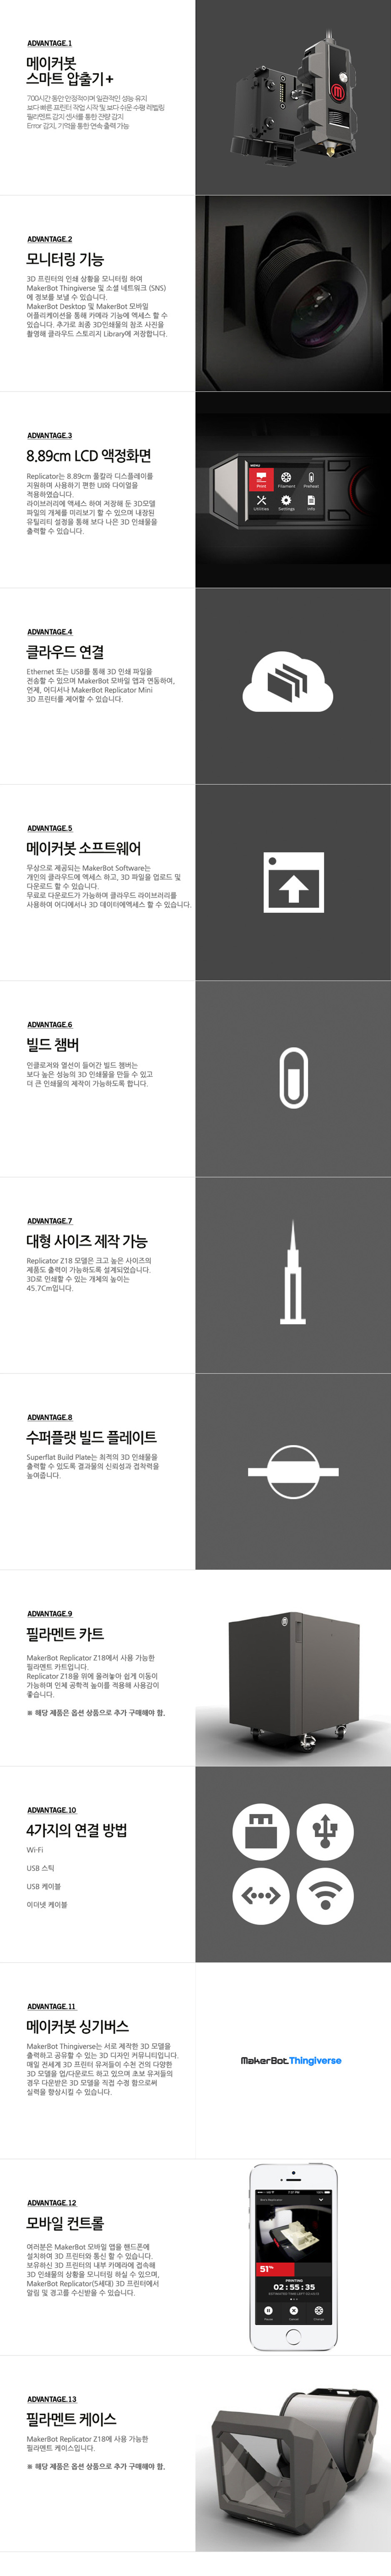 Z18 제품소개3.jpg